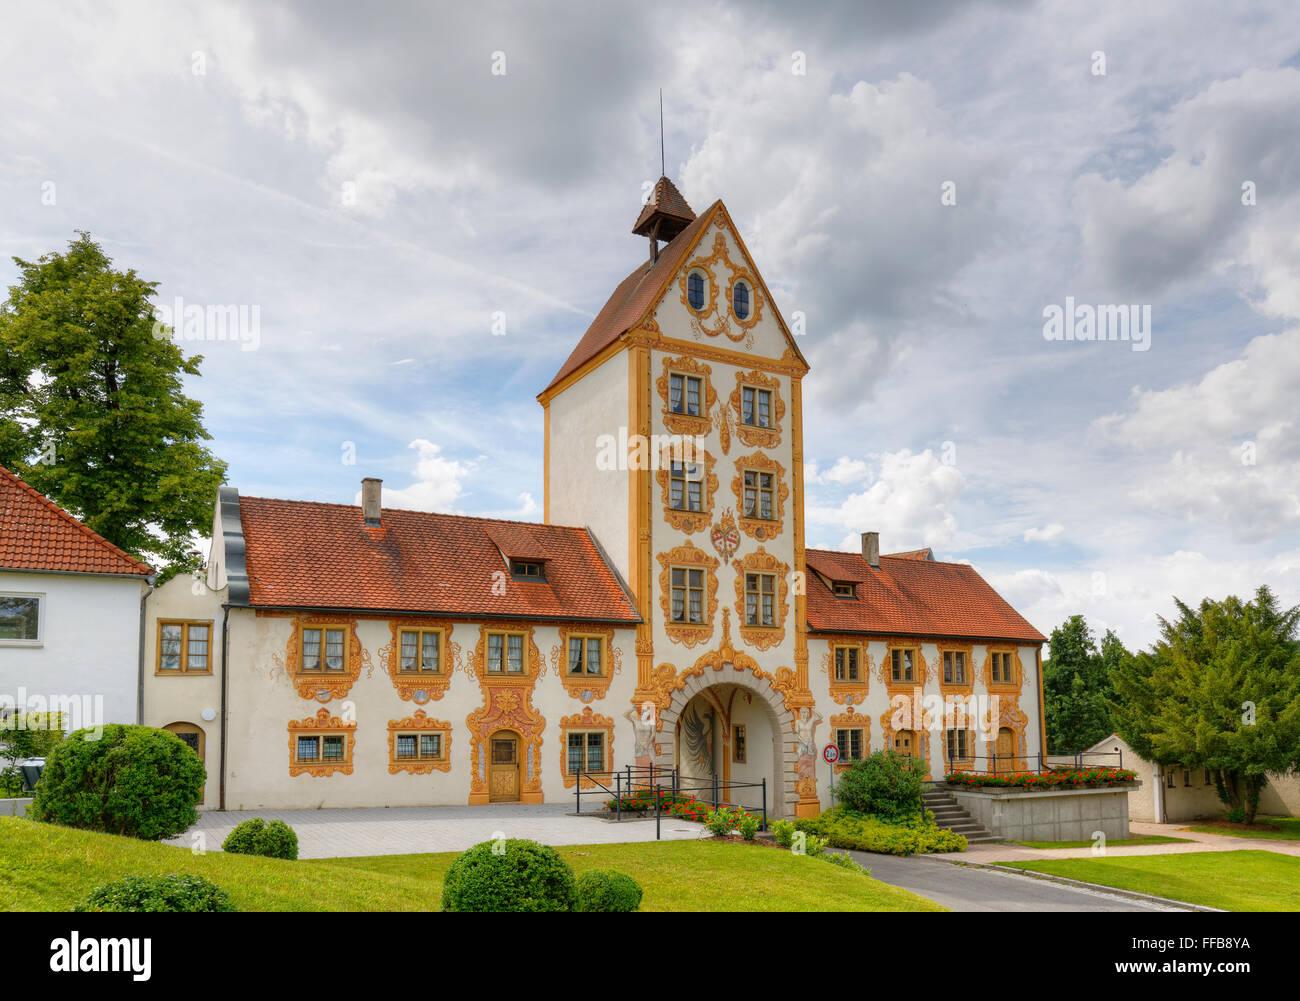 West gate, city gate in Rot an der Rot, Upper Swabia, Swabia, Baden-Württemberg, Germany - Stock Image